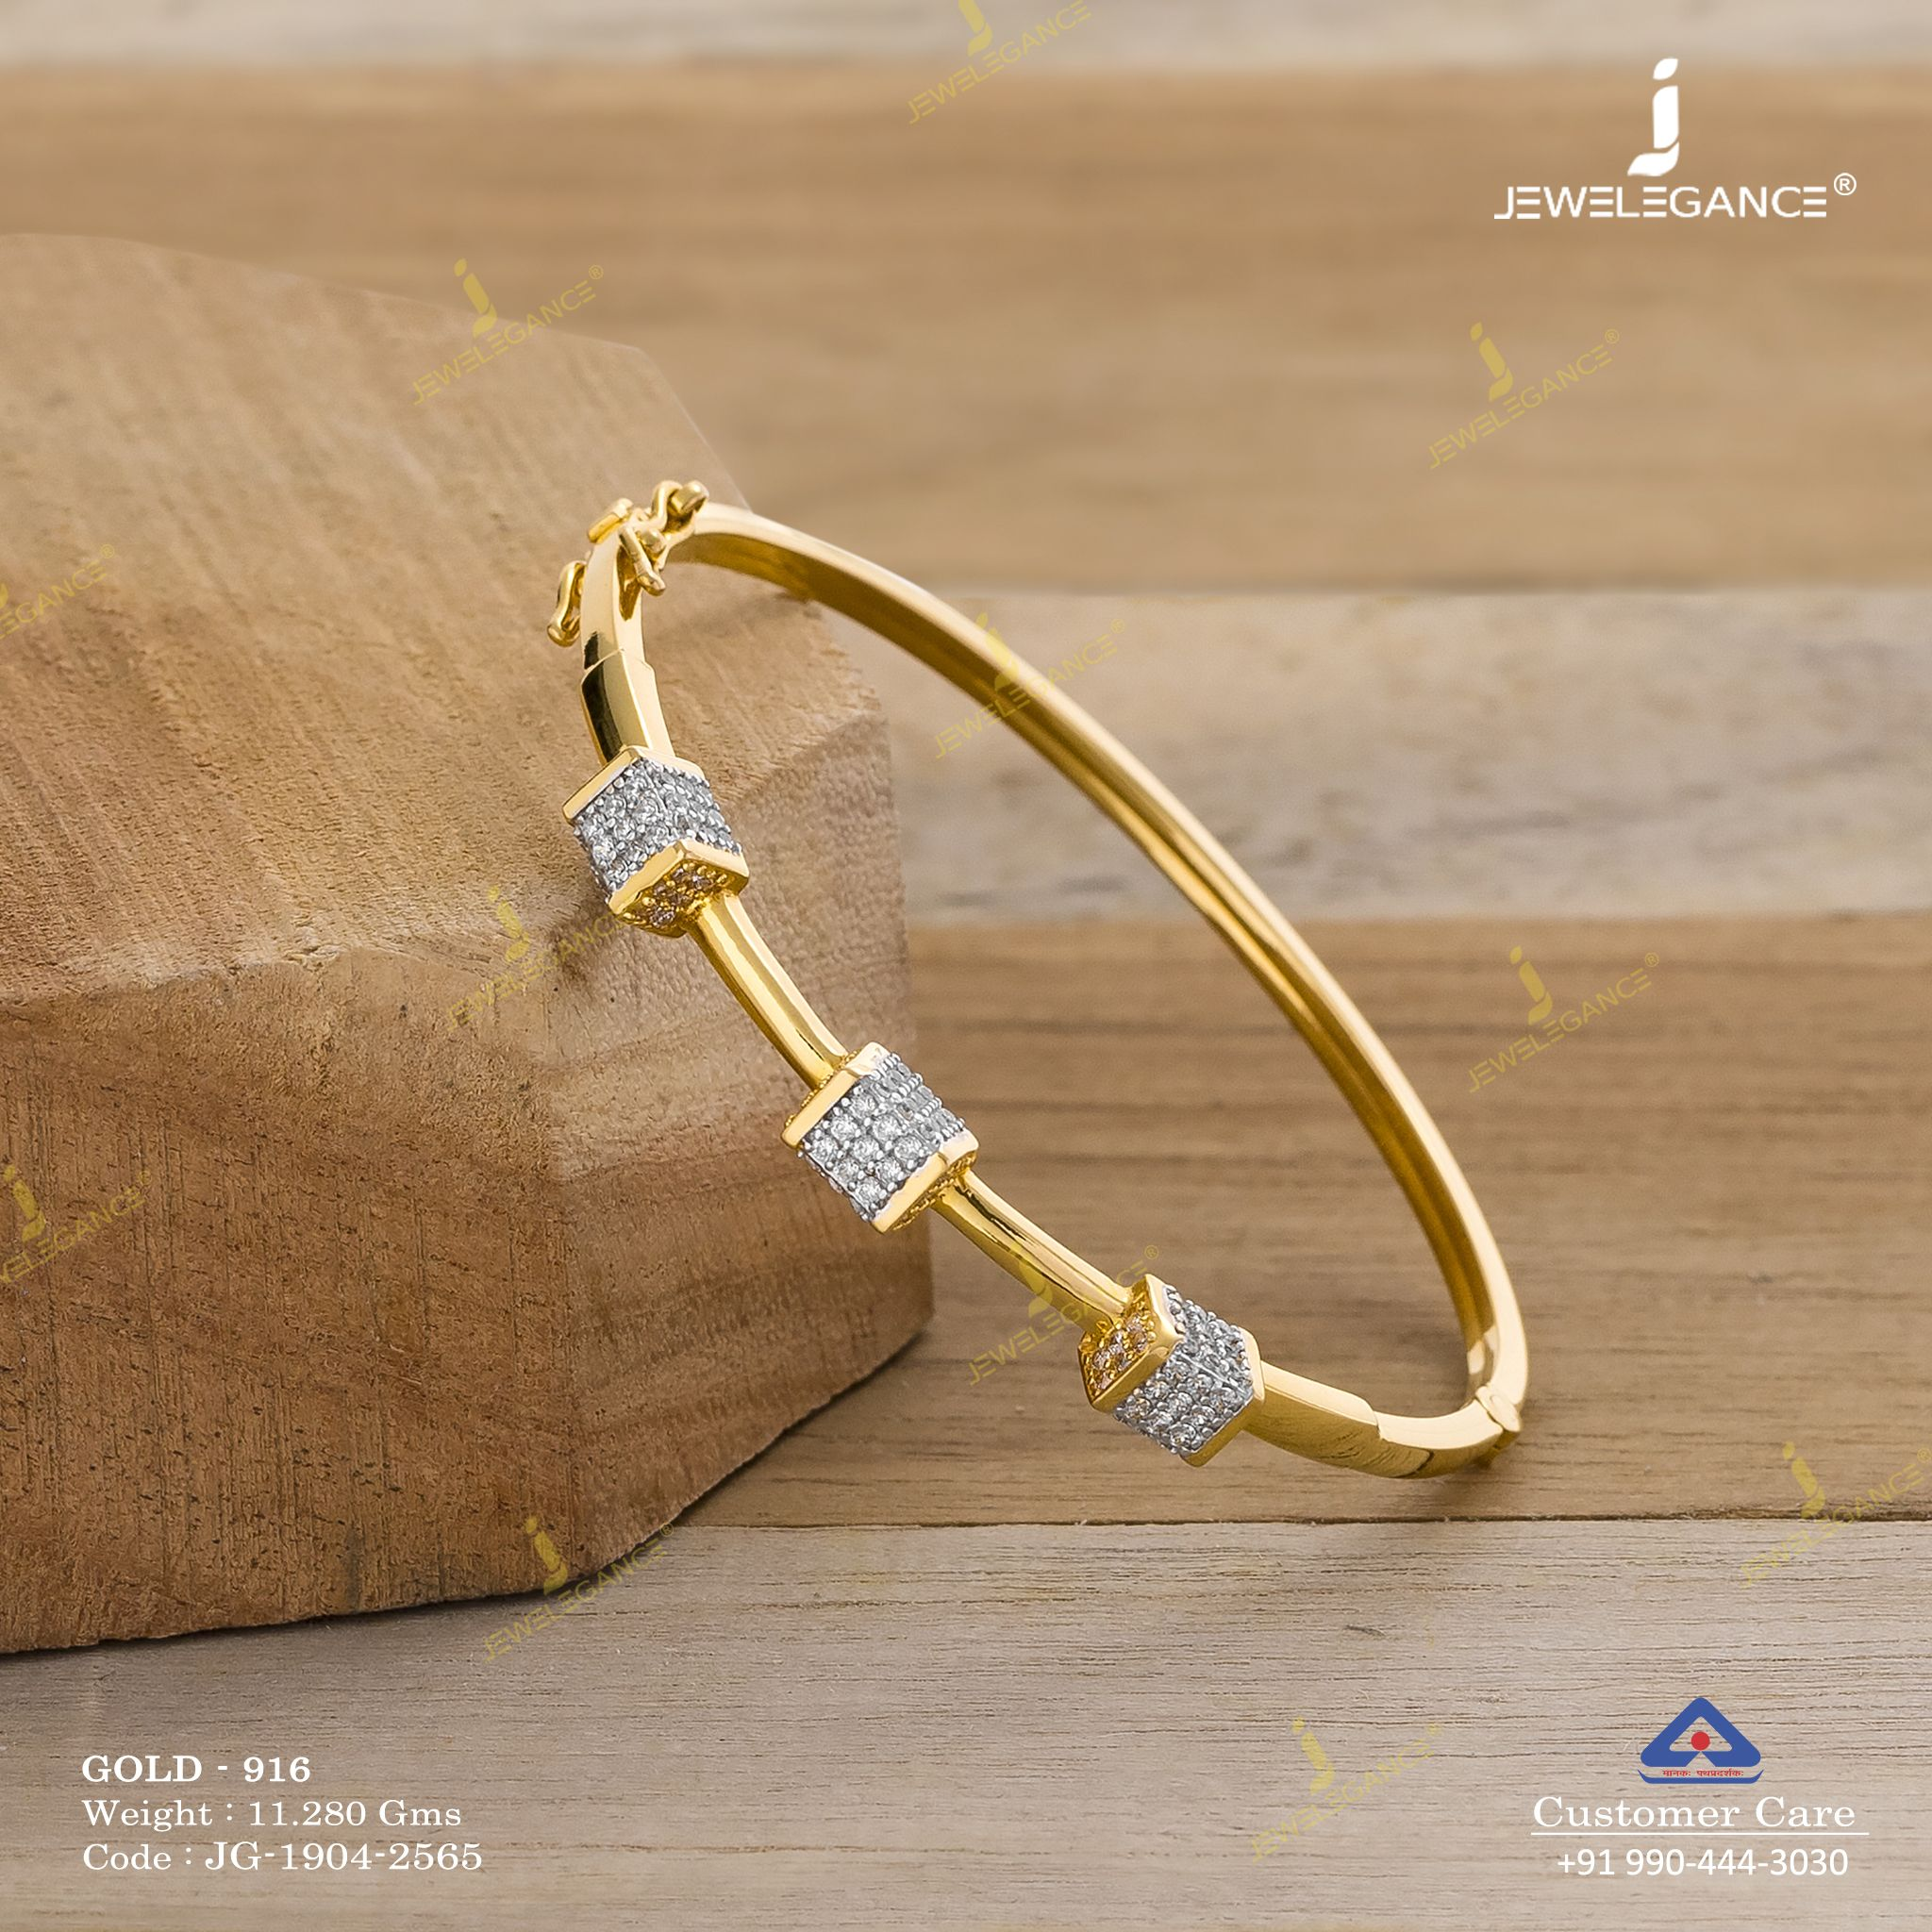 identification-bracelets Size 14K Yellow Gold HallMarked 9.25 inches IJ| SI 0.045 cttw Round-Cut-Diamond